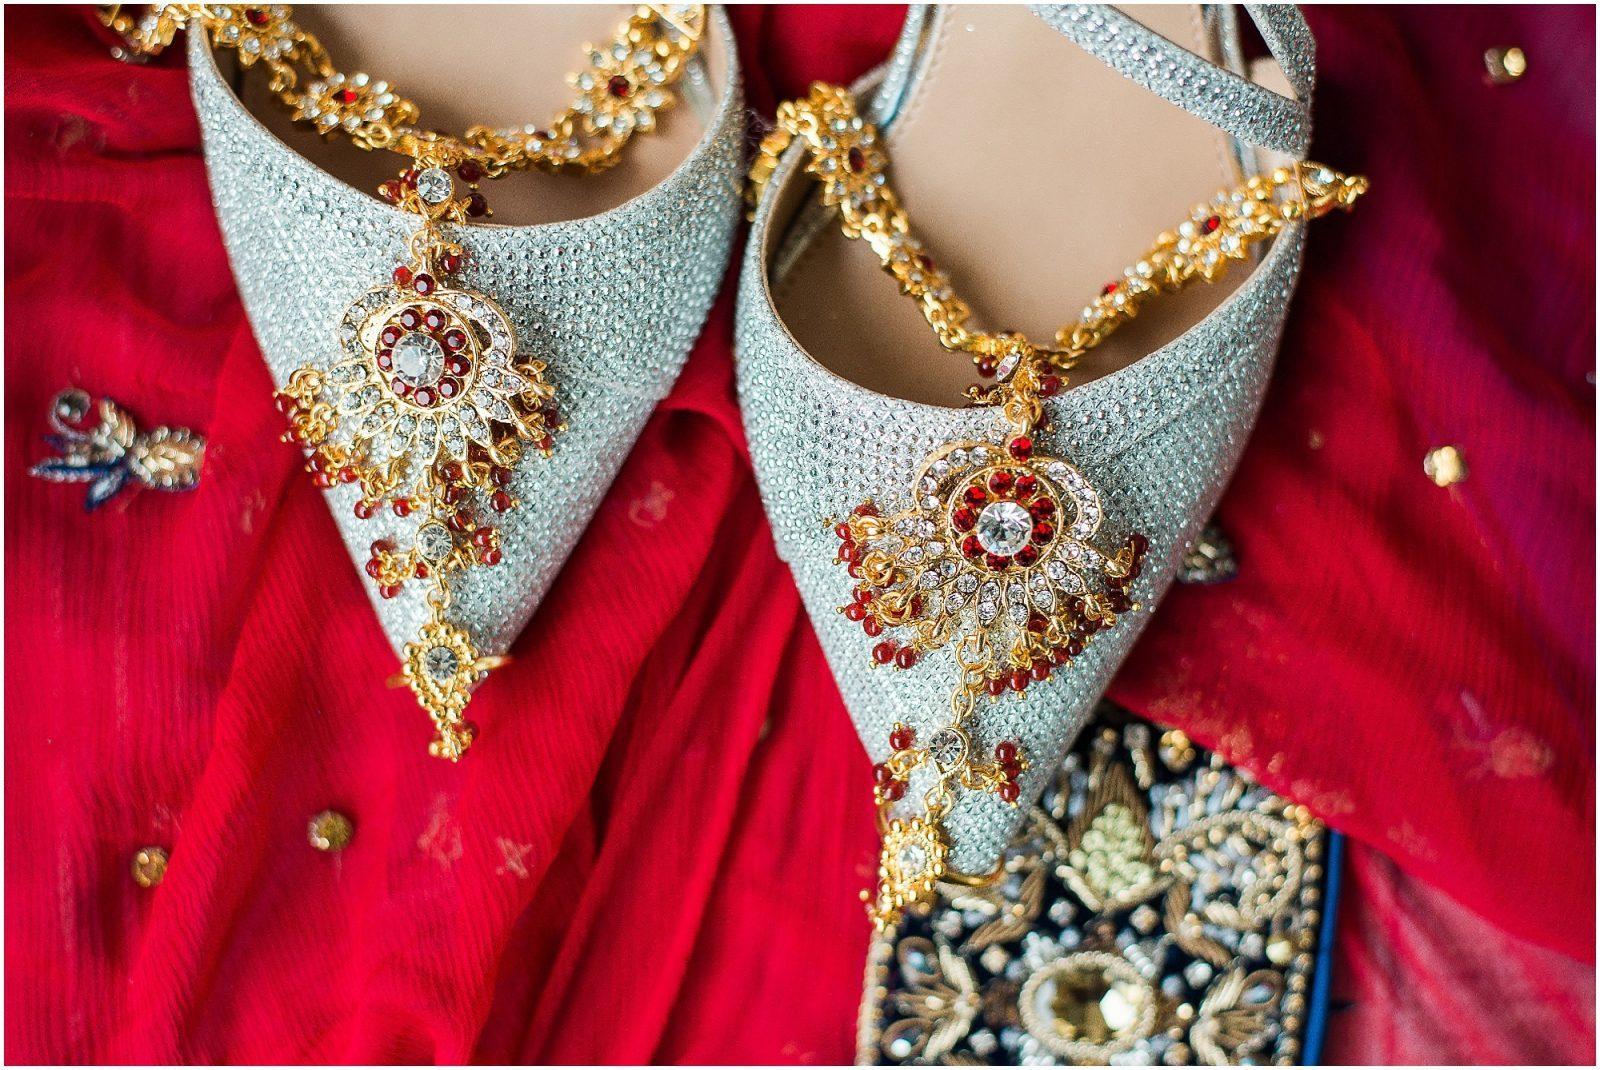 South Asian Wedding Toronto - Mehndi - Nikah, walima, indian wedding, pakistani wedding. Sarah & Sajid - bridal details